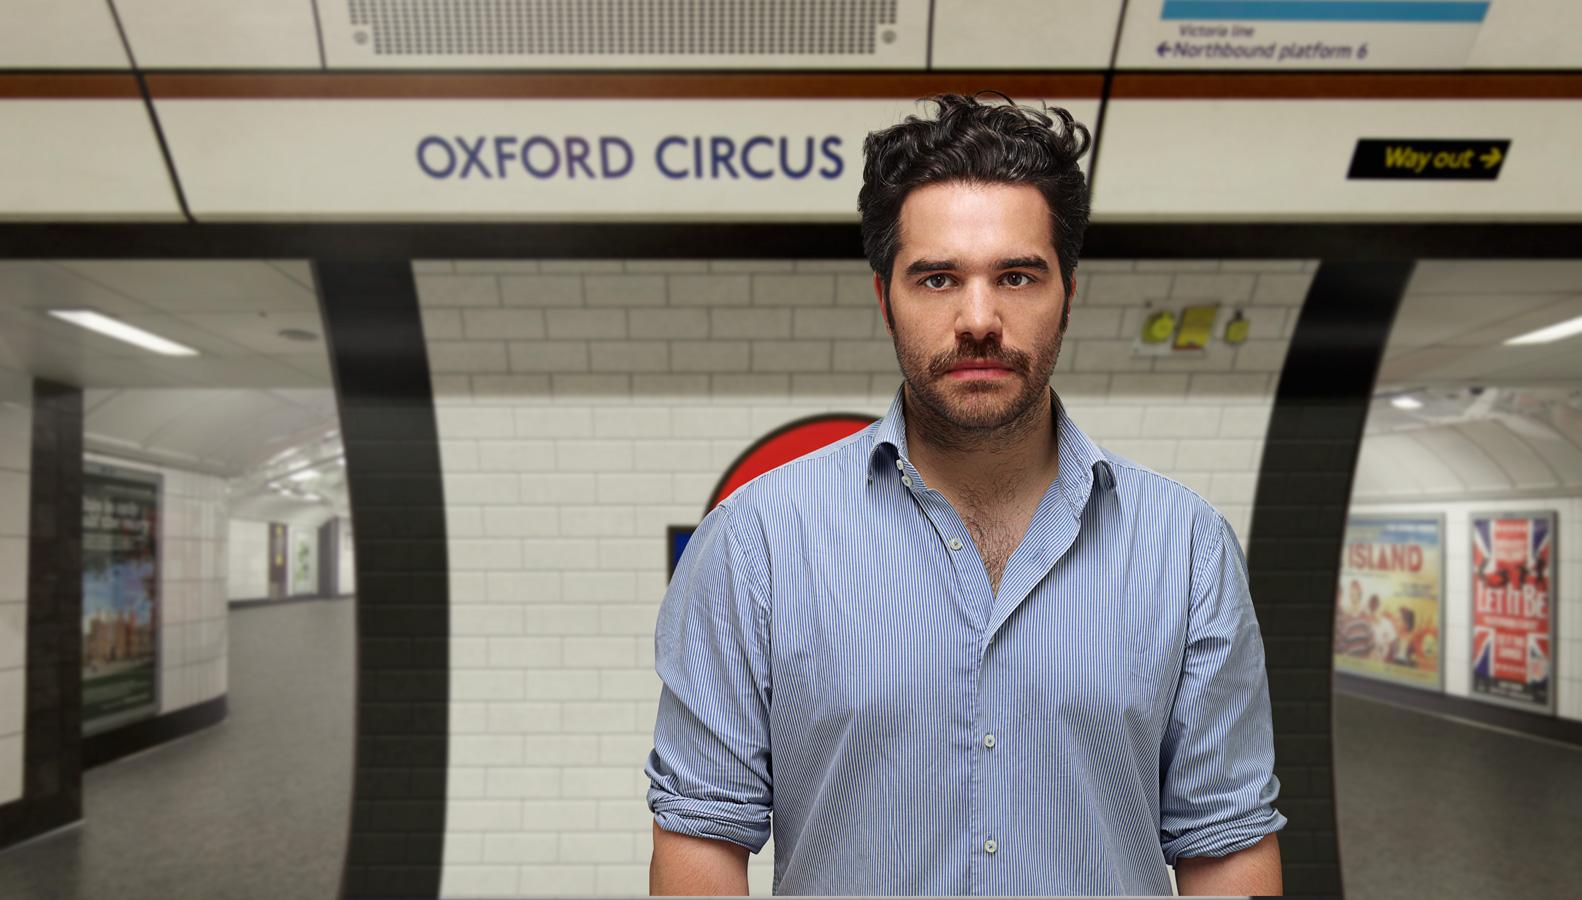 Oxford_Circus_TUBE-Close